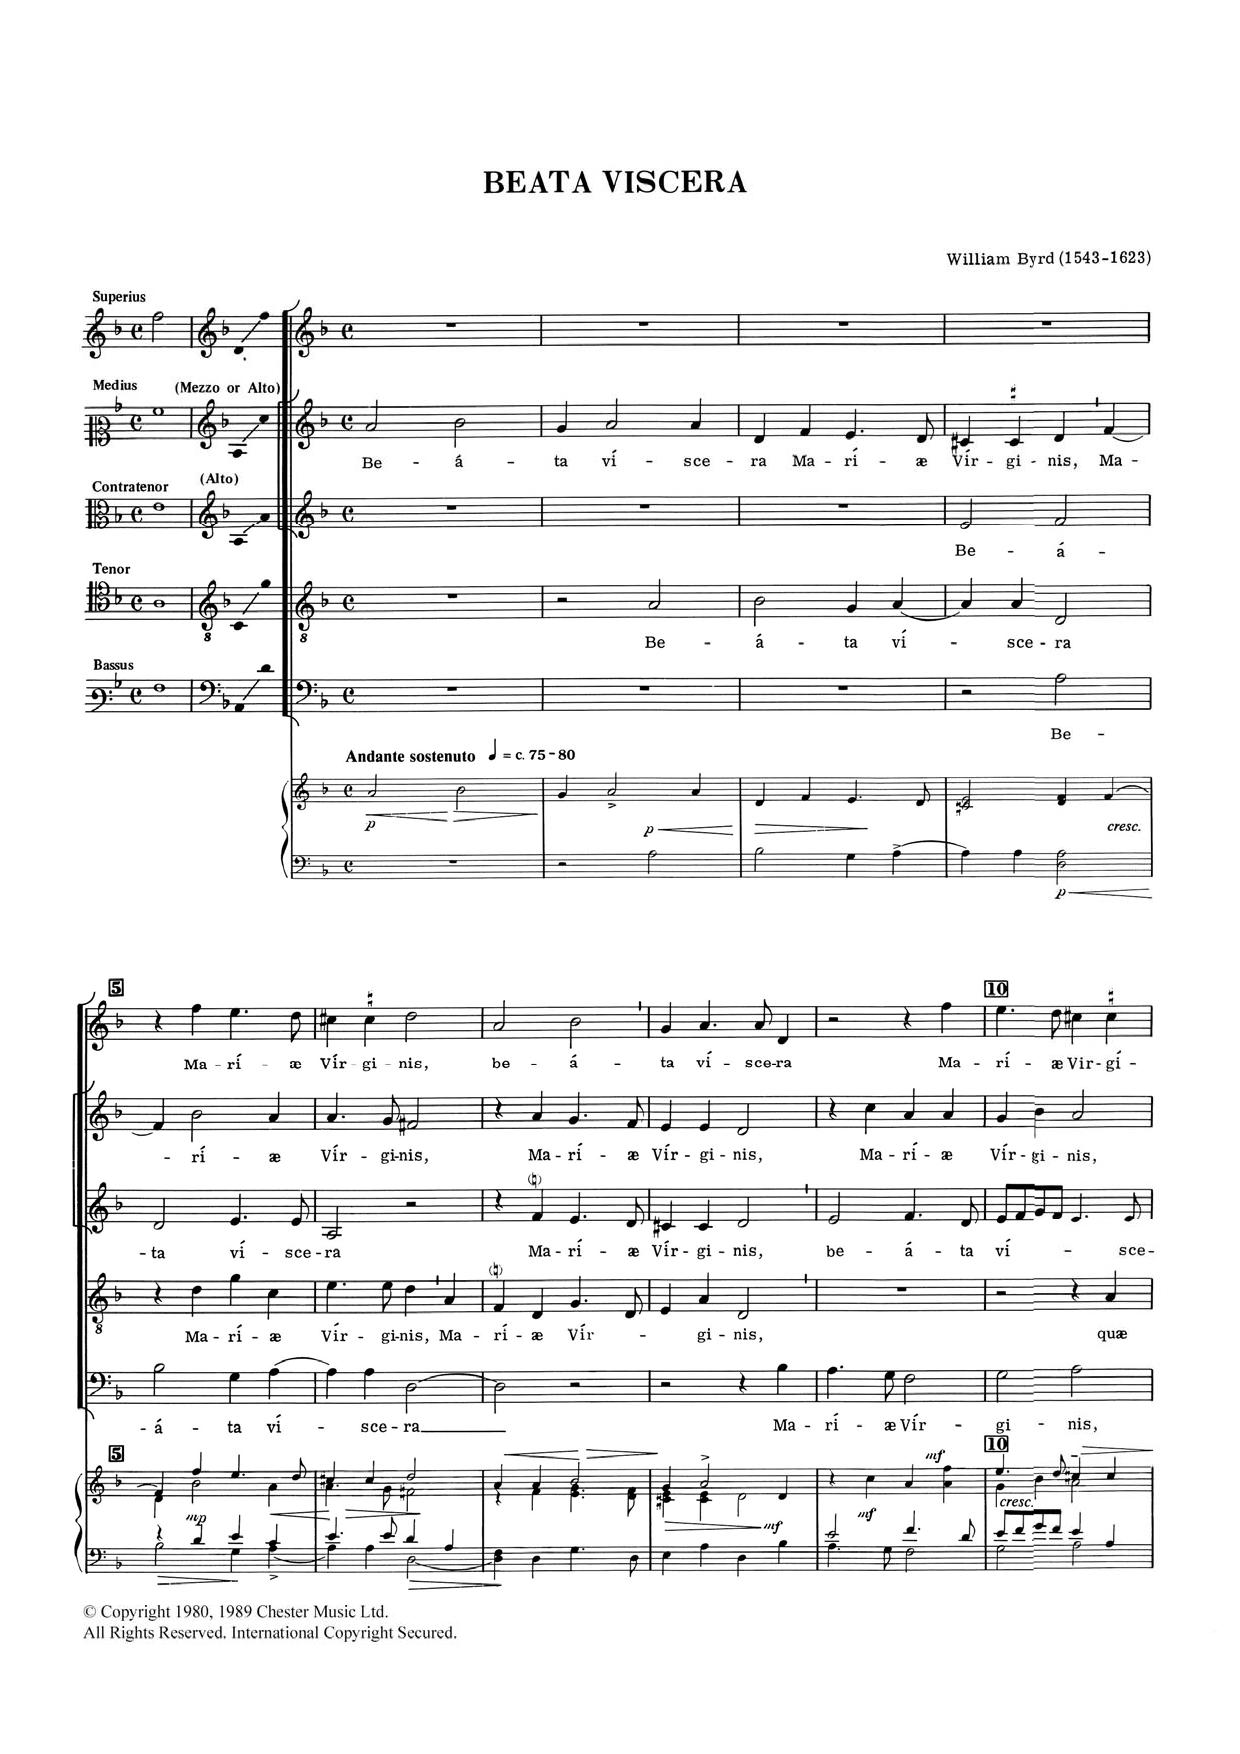 William Byrd - Beata Viscera